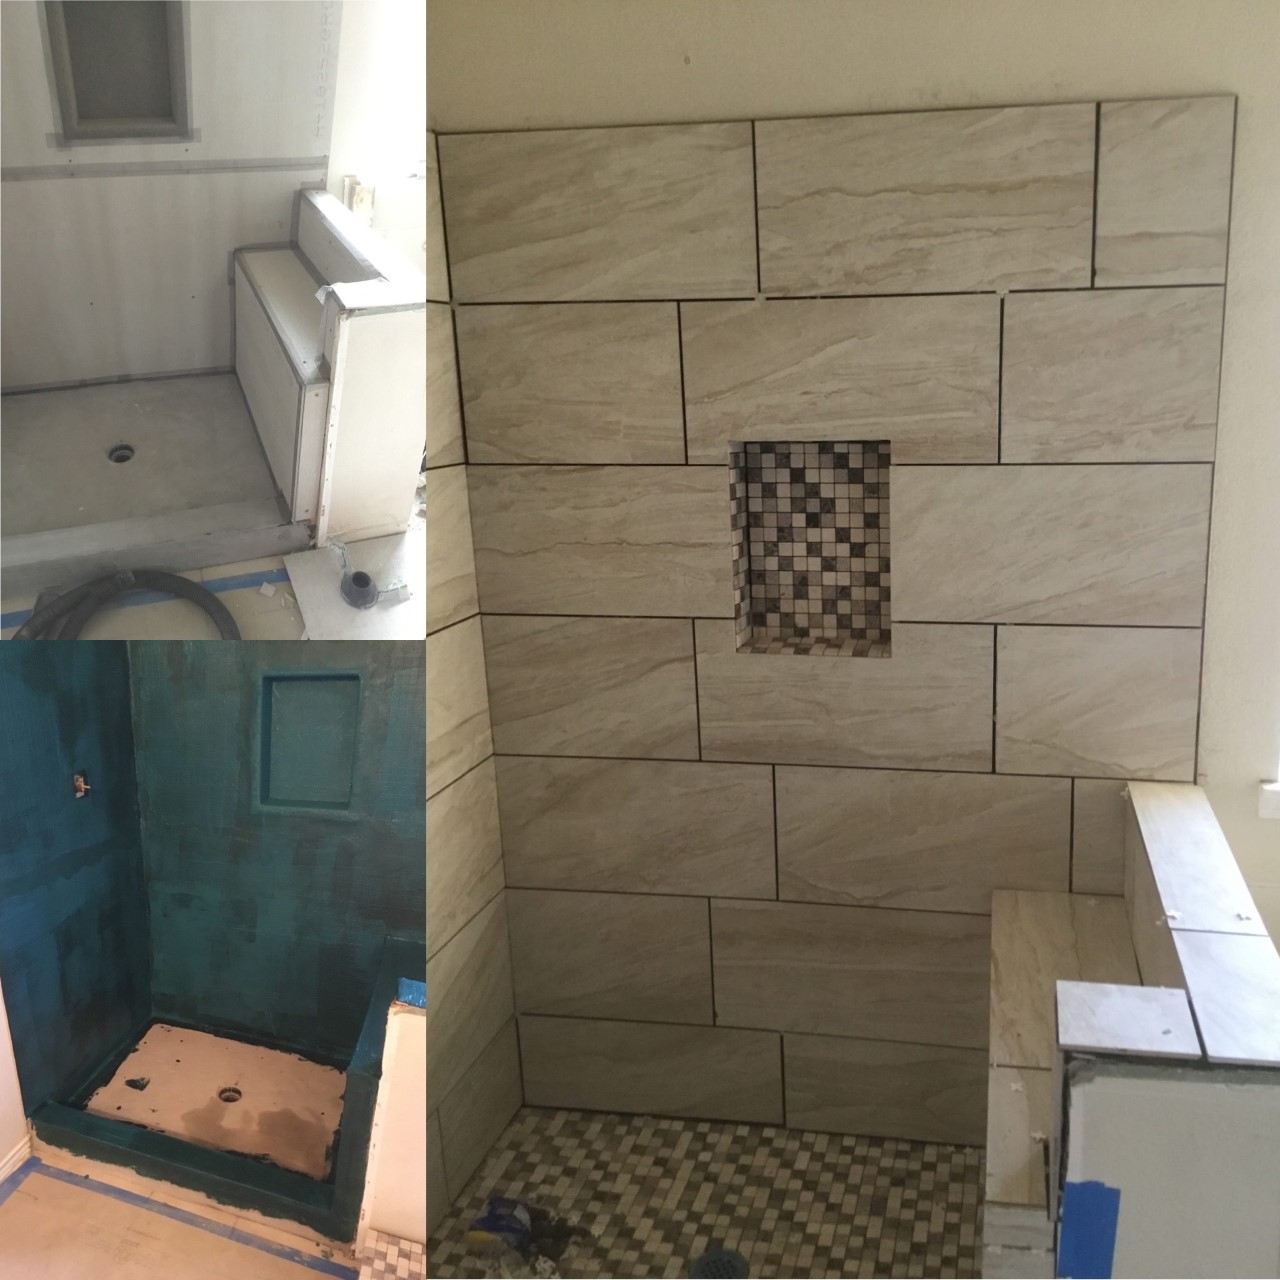 Handyman Melissa bathroom renovation and repair.